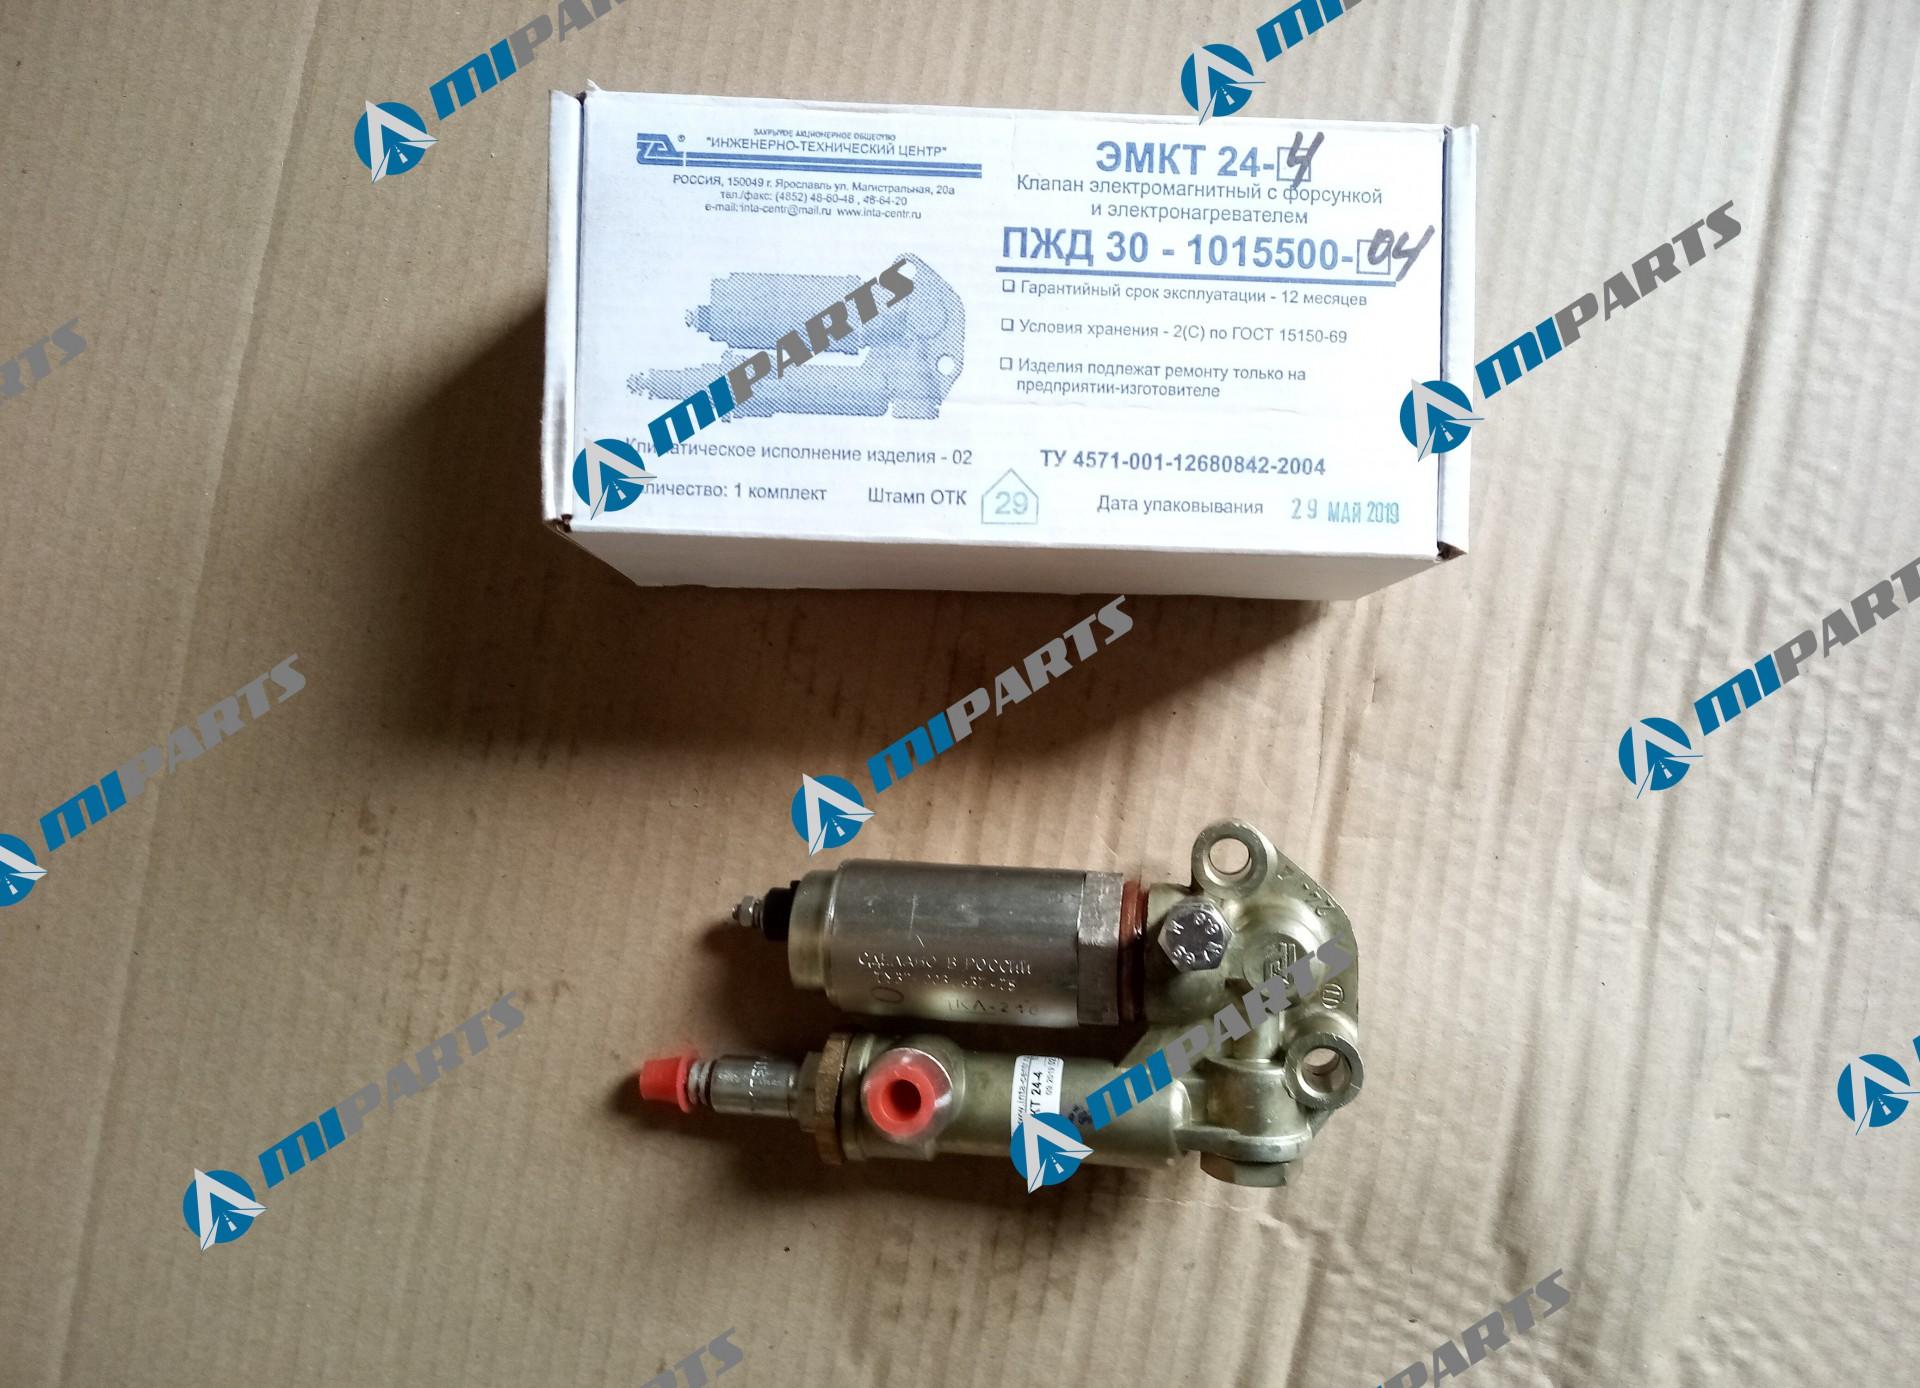 ПЖД30-1015500-04 Электромагн.клапан ПЖД30 фото запчасти